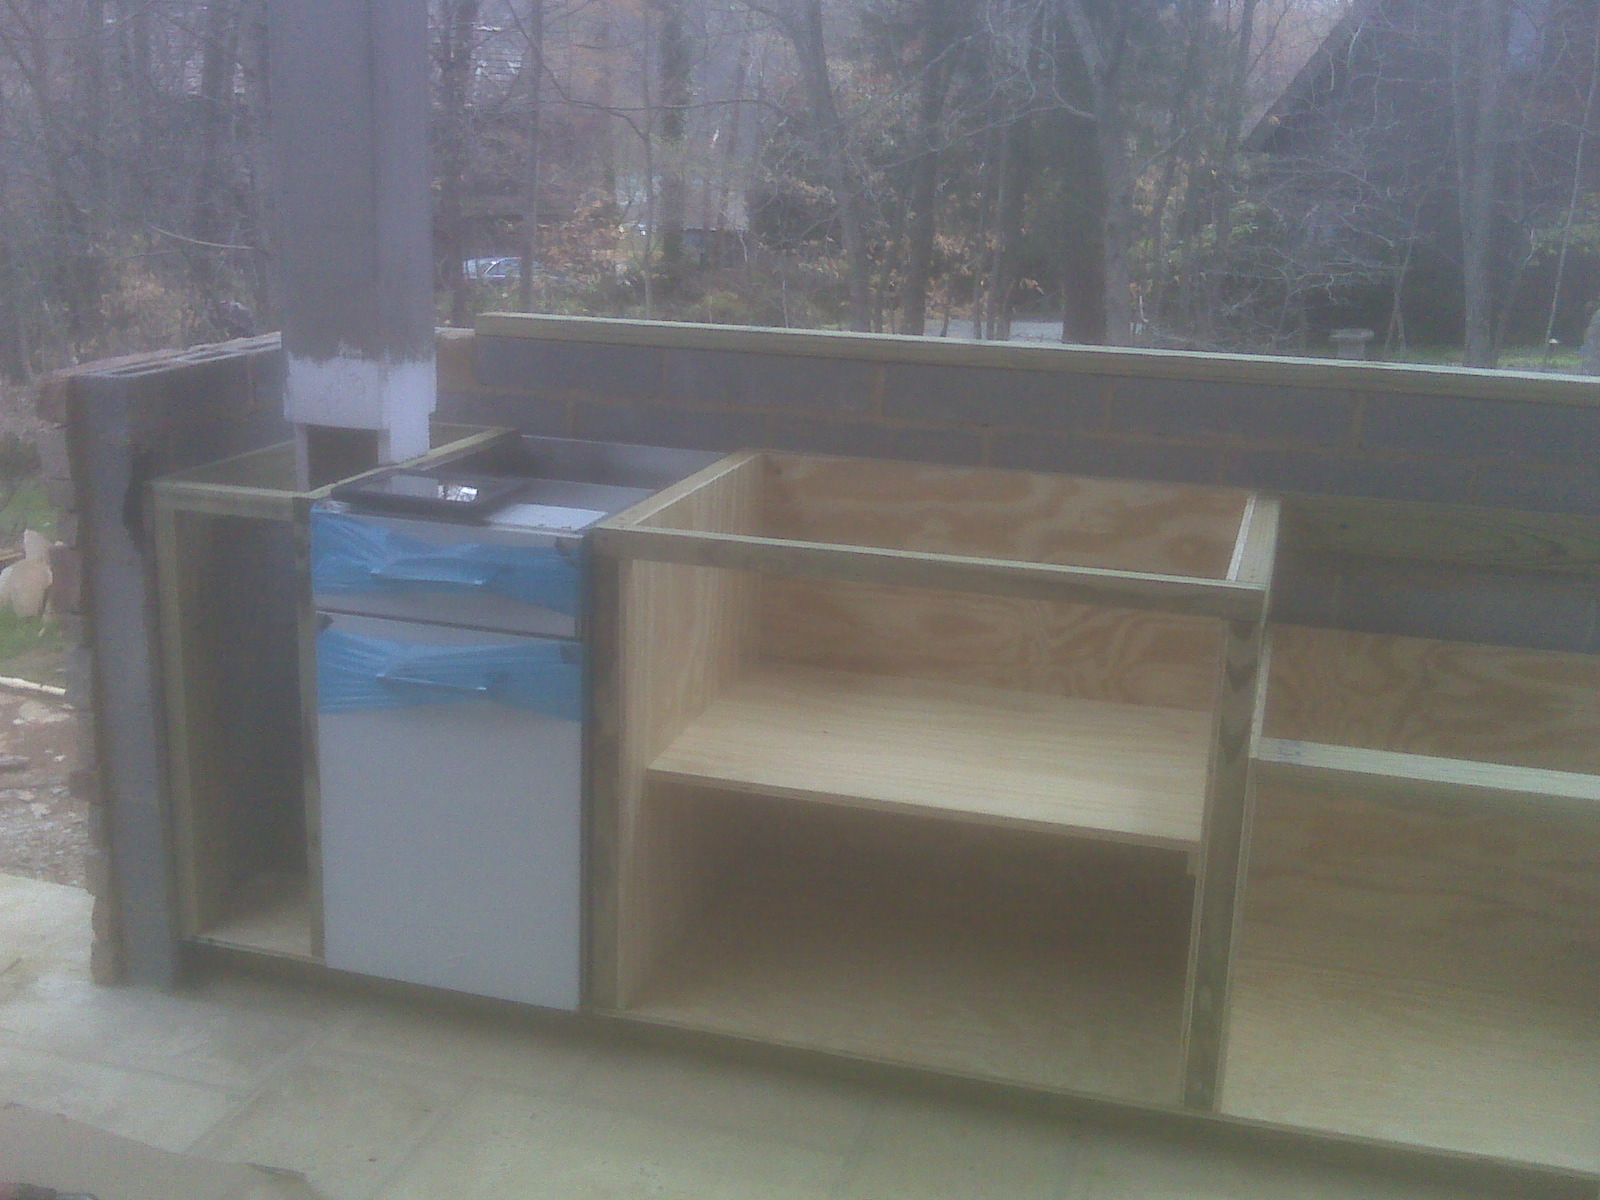 Cabinets 1.jpg